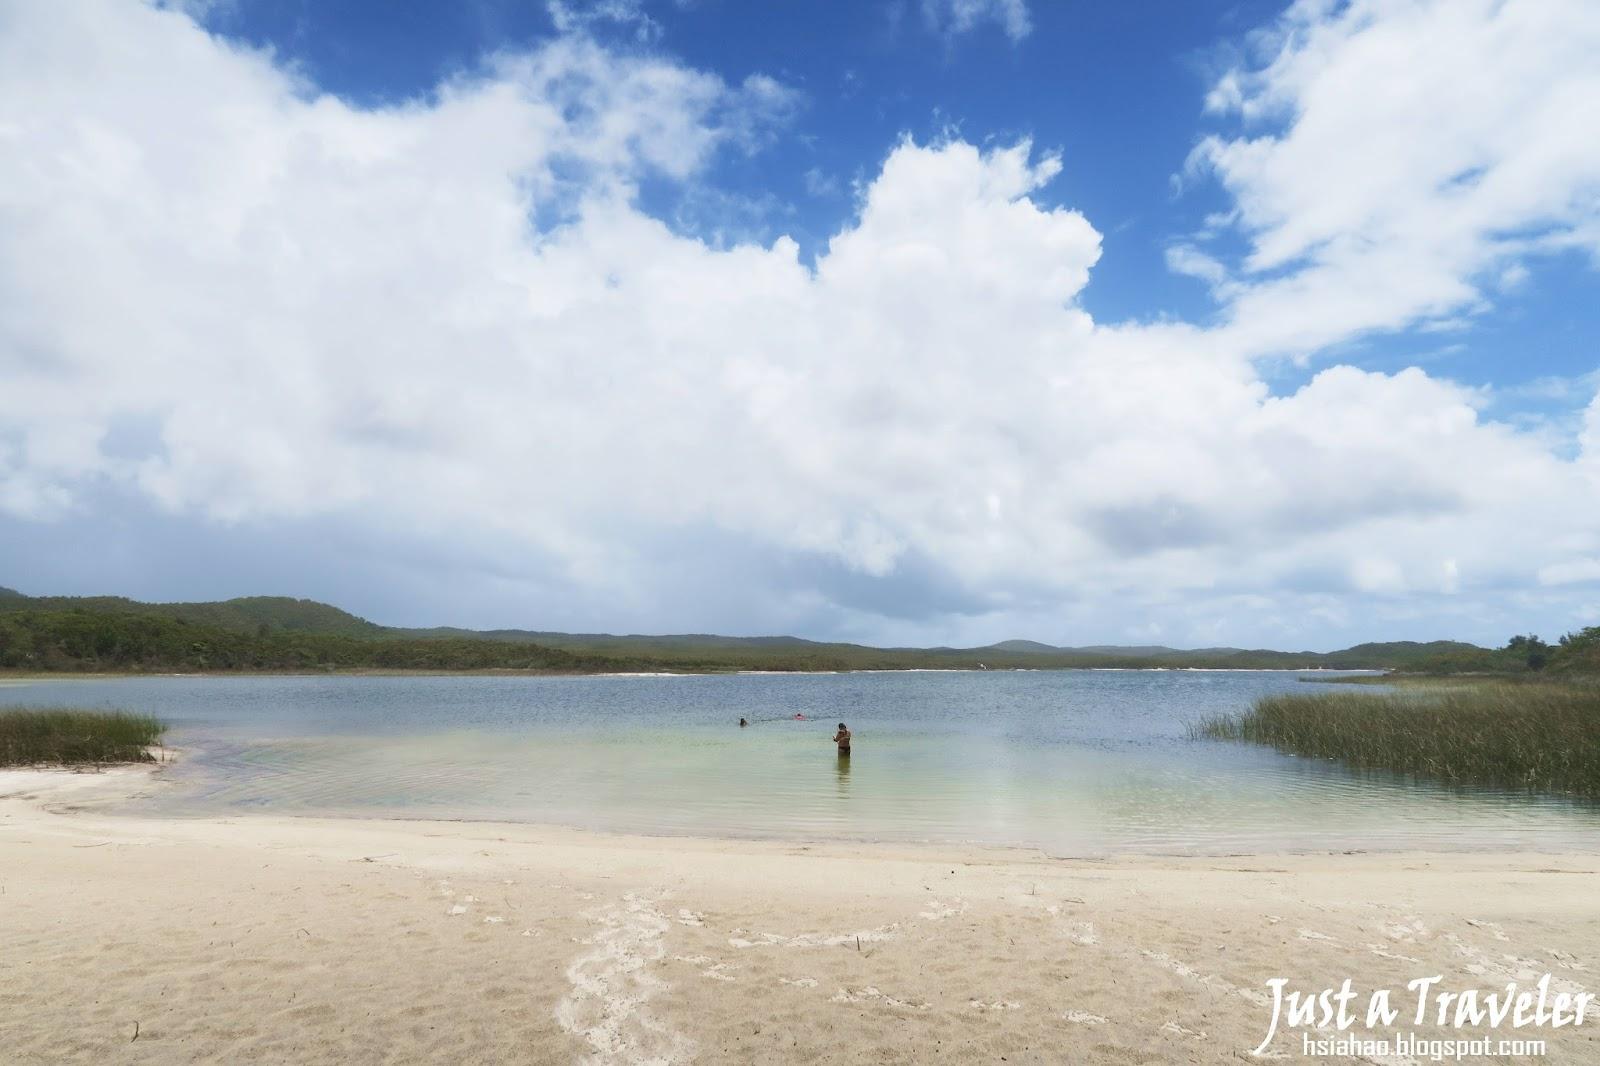 布里斯本-摩頓島-藍湖-Blue Lagoon-景點-交通-住宿-推薦-旅遊-自由行-澳洲-Brisbane-Moreton-Island-Tourist-Attraction-Travel-Australia